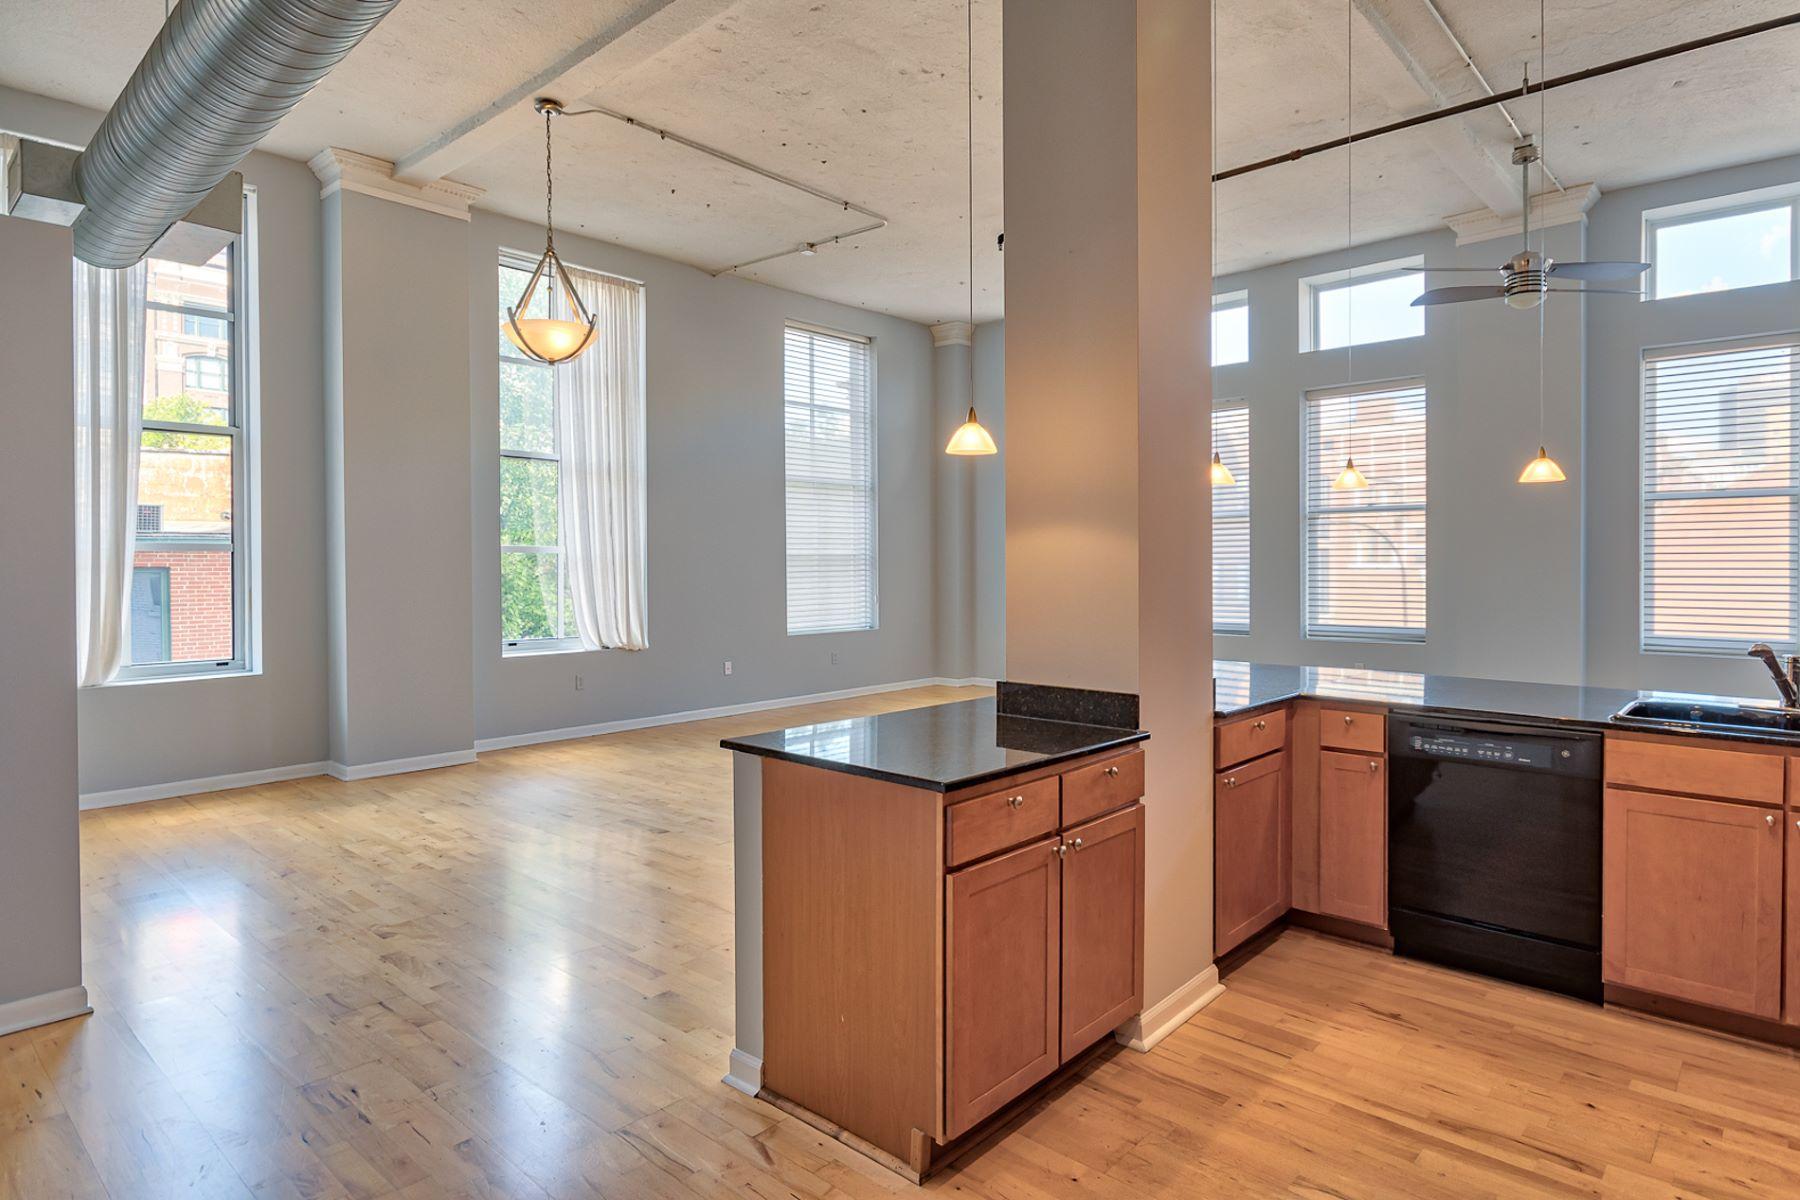 Additional photo for property listing at Locust Street 1501 Locust Street # 204 St. Louis, Missouri 63131 United States